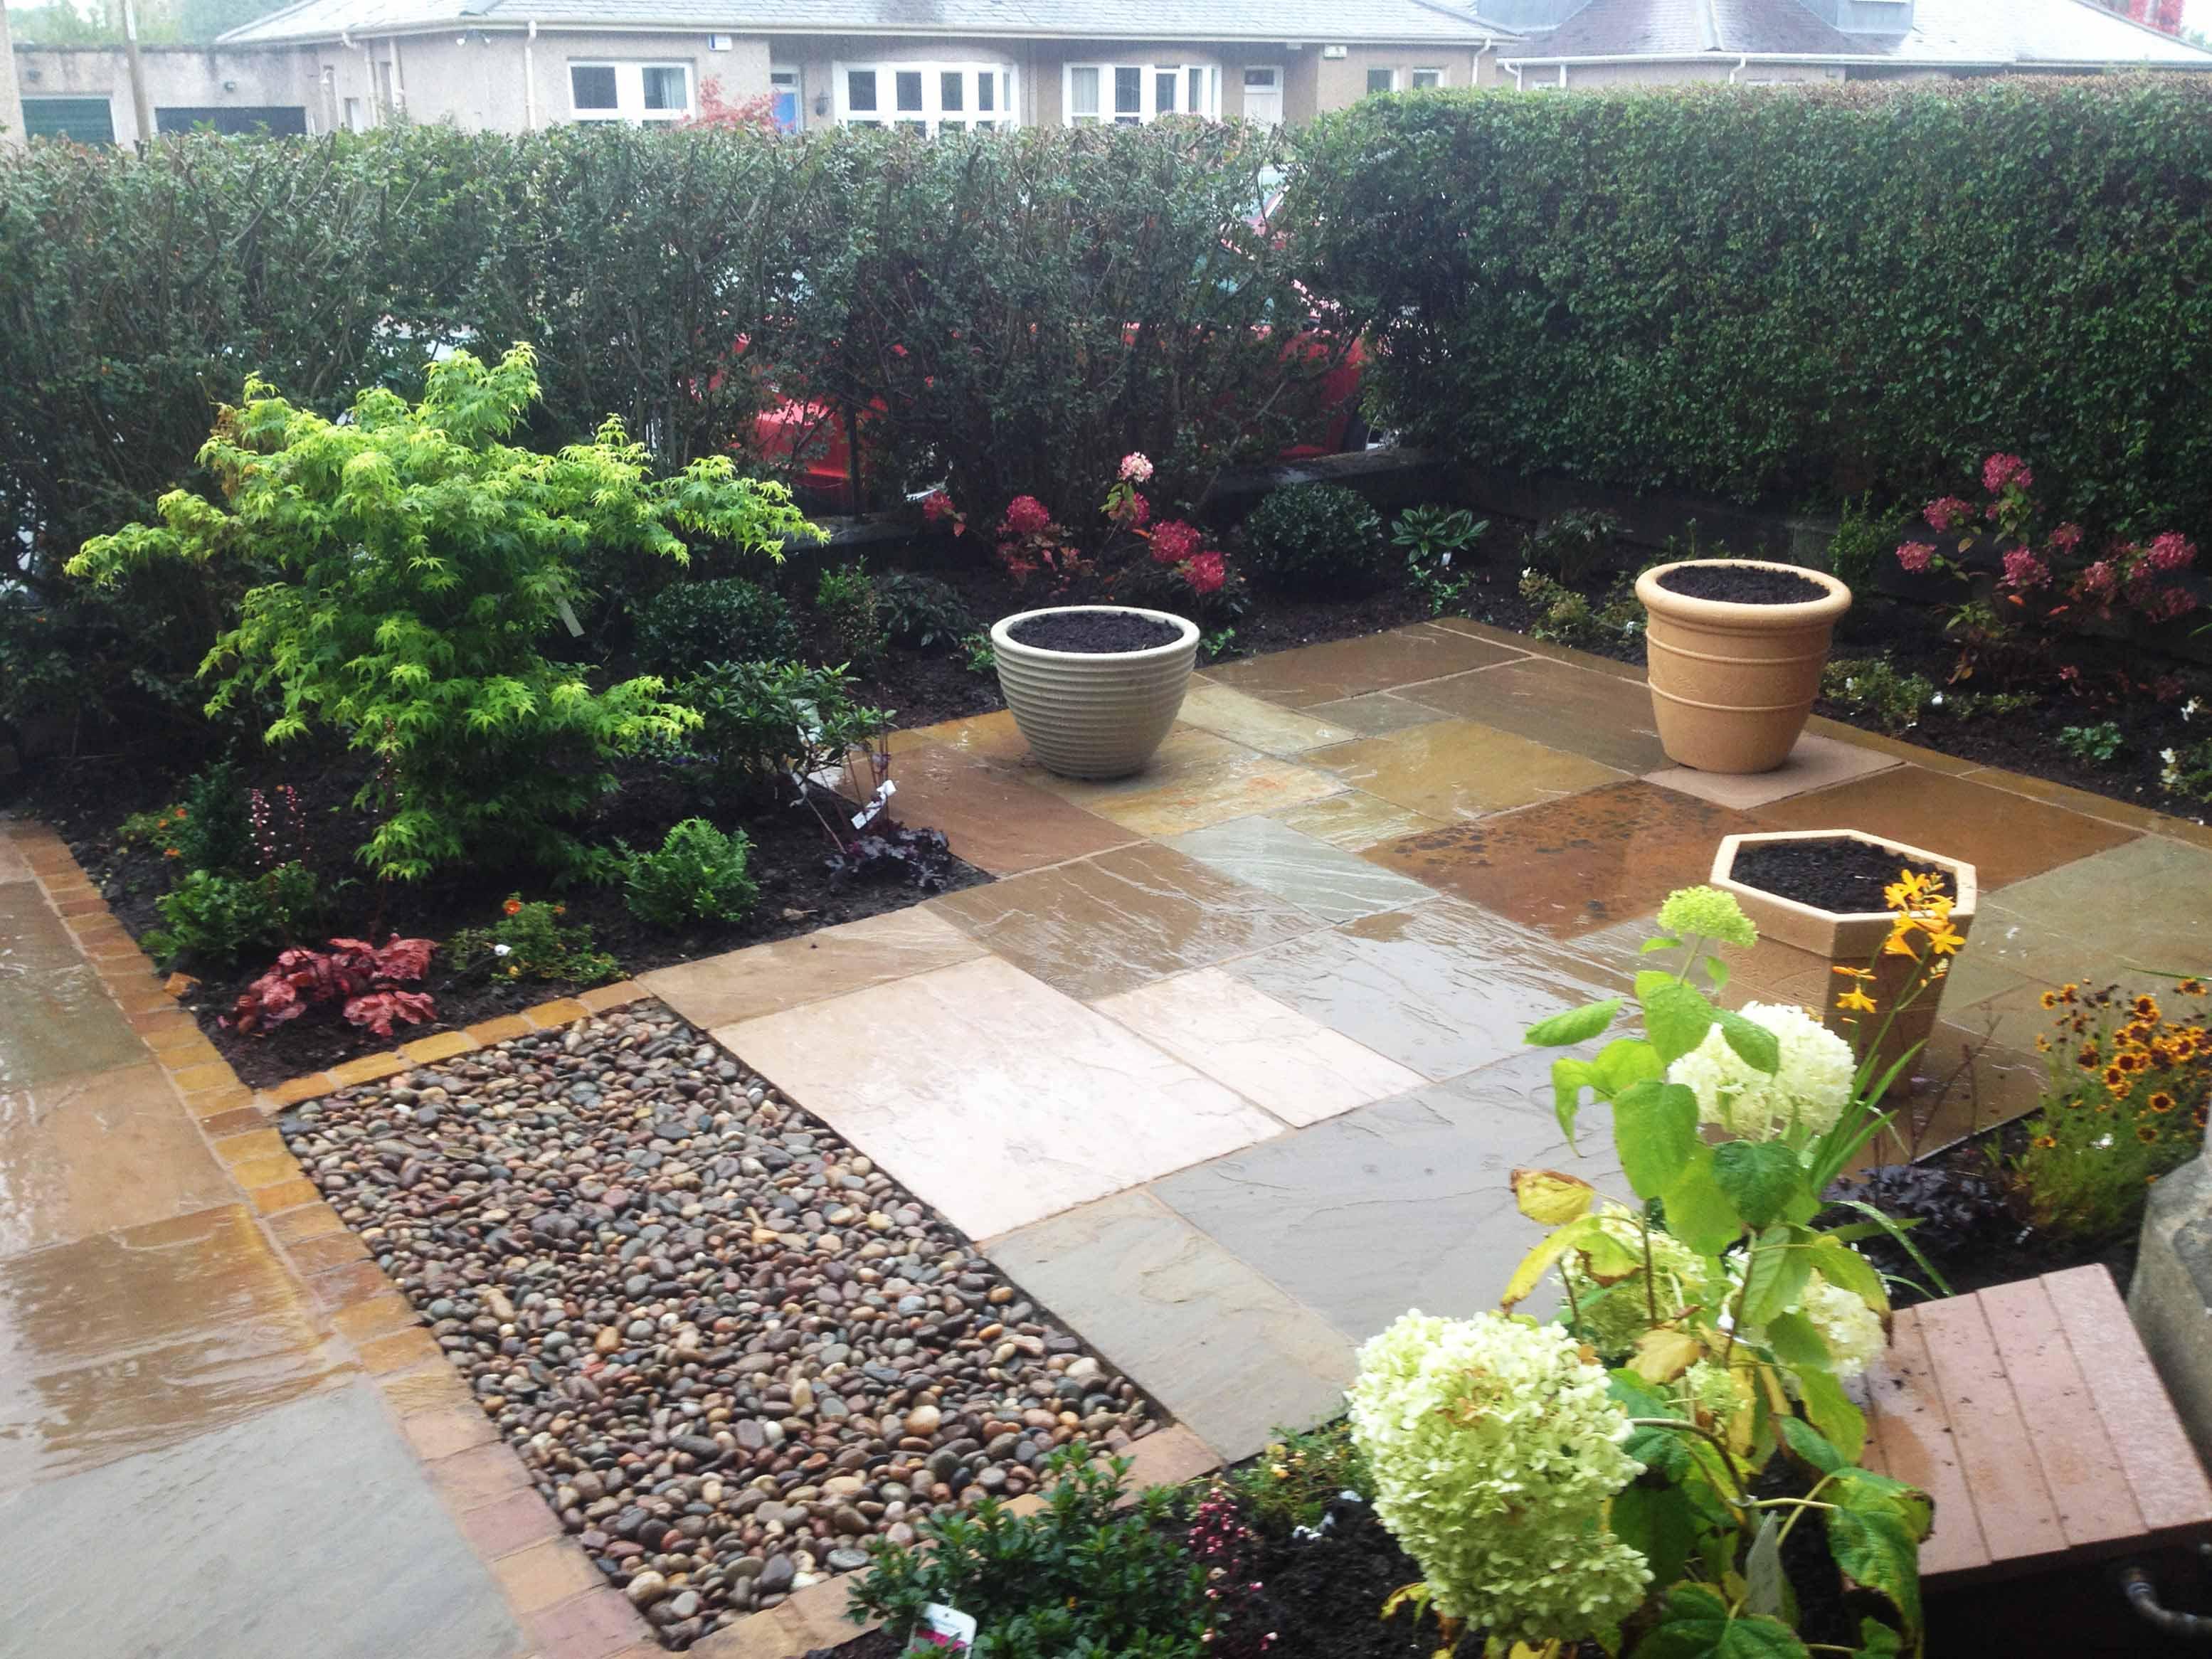 project7 title | Motif Garden Design